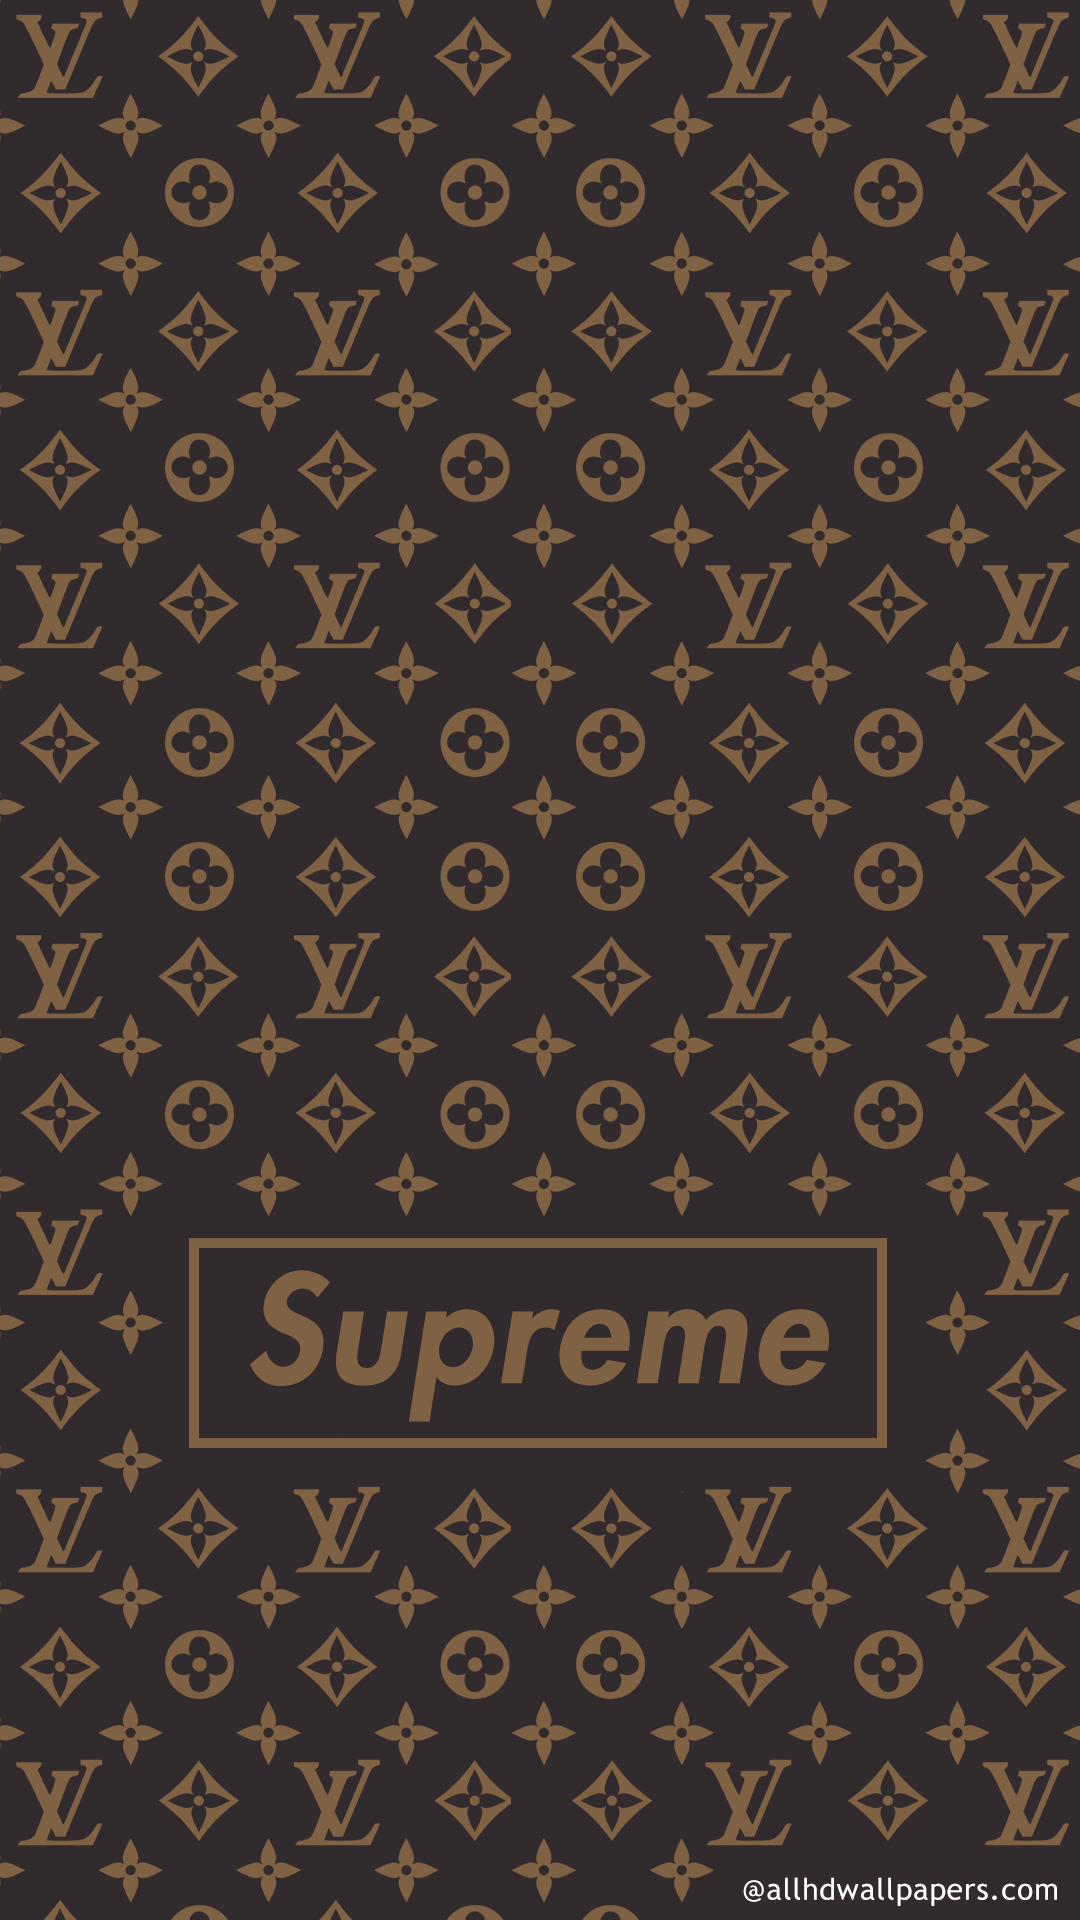 70 Supreme Wallpapers in 4K   AllHDWallpapers 1080x1920